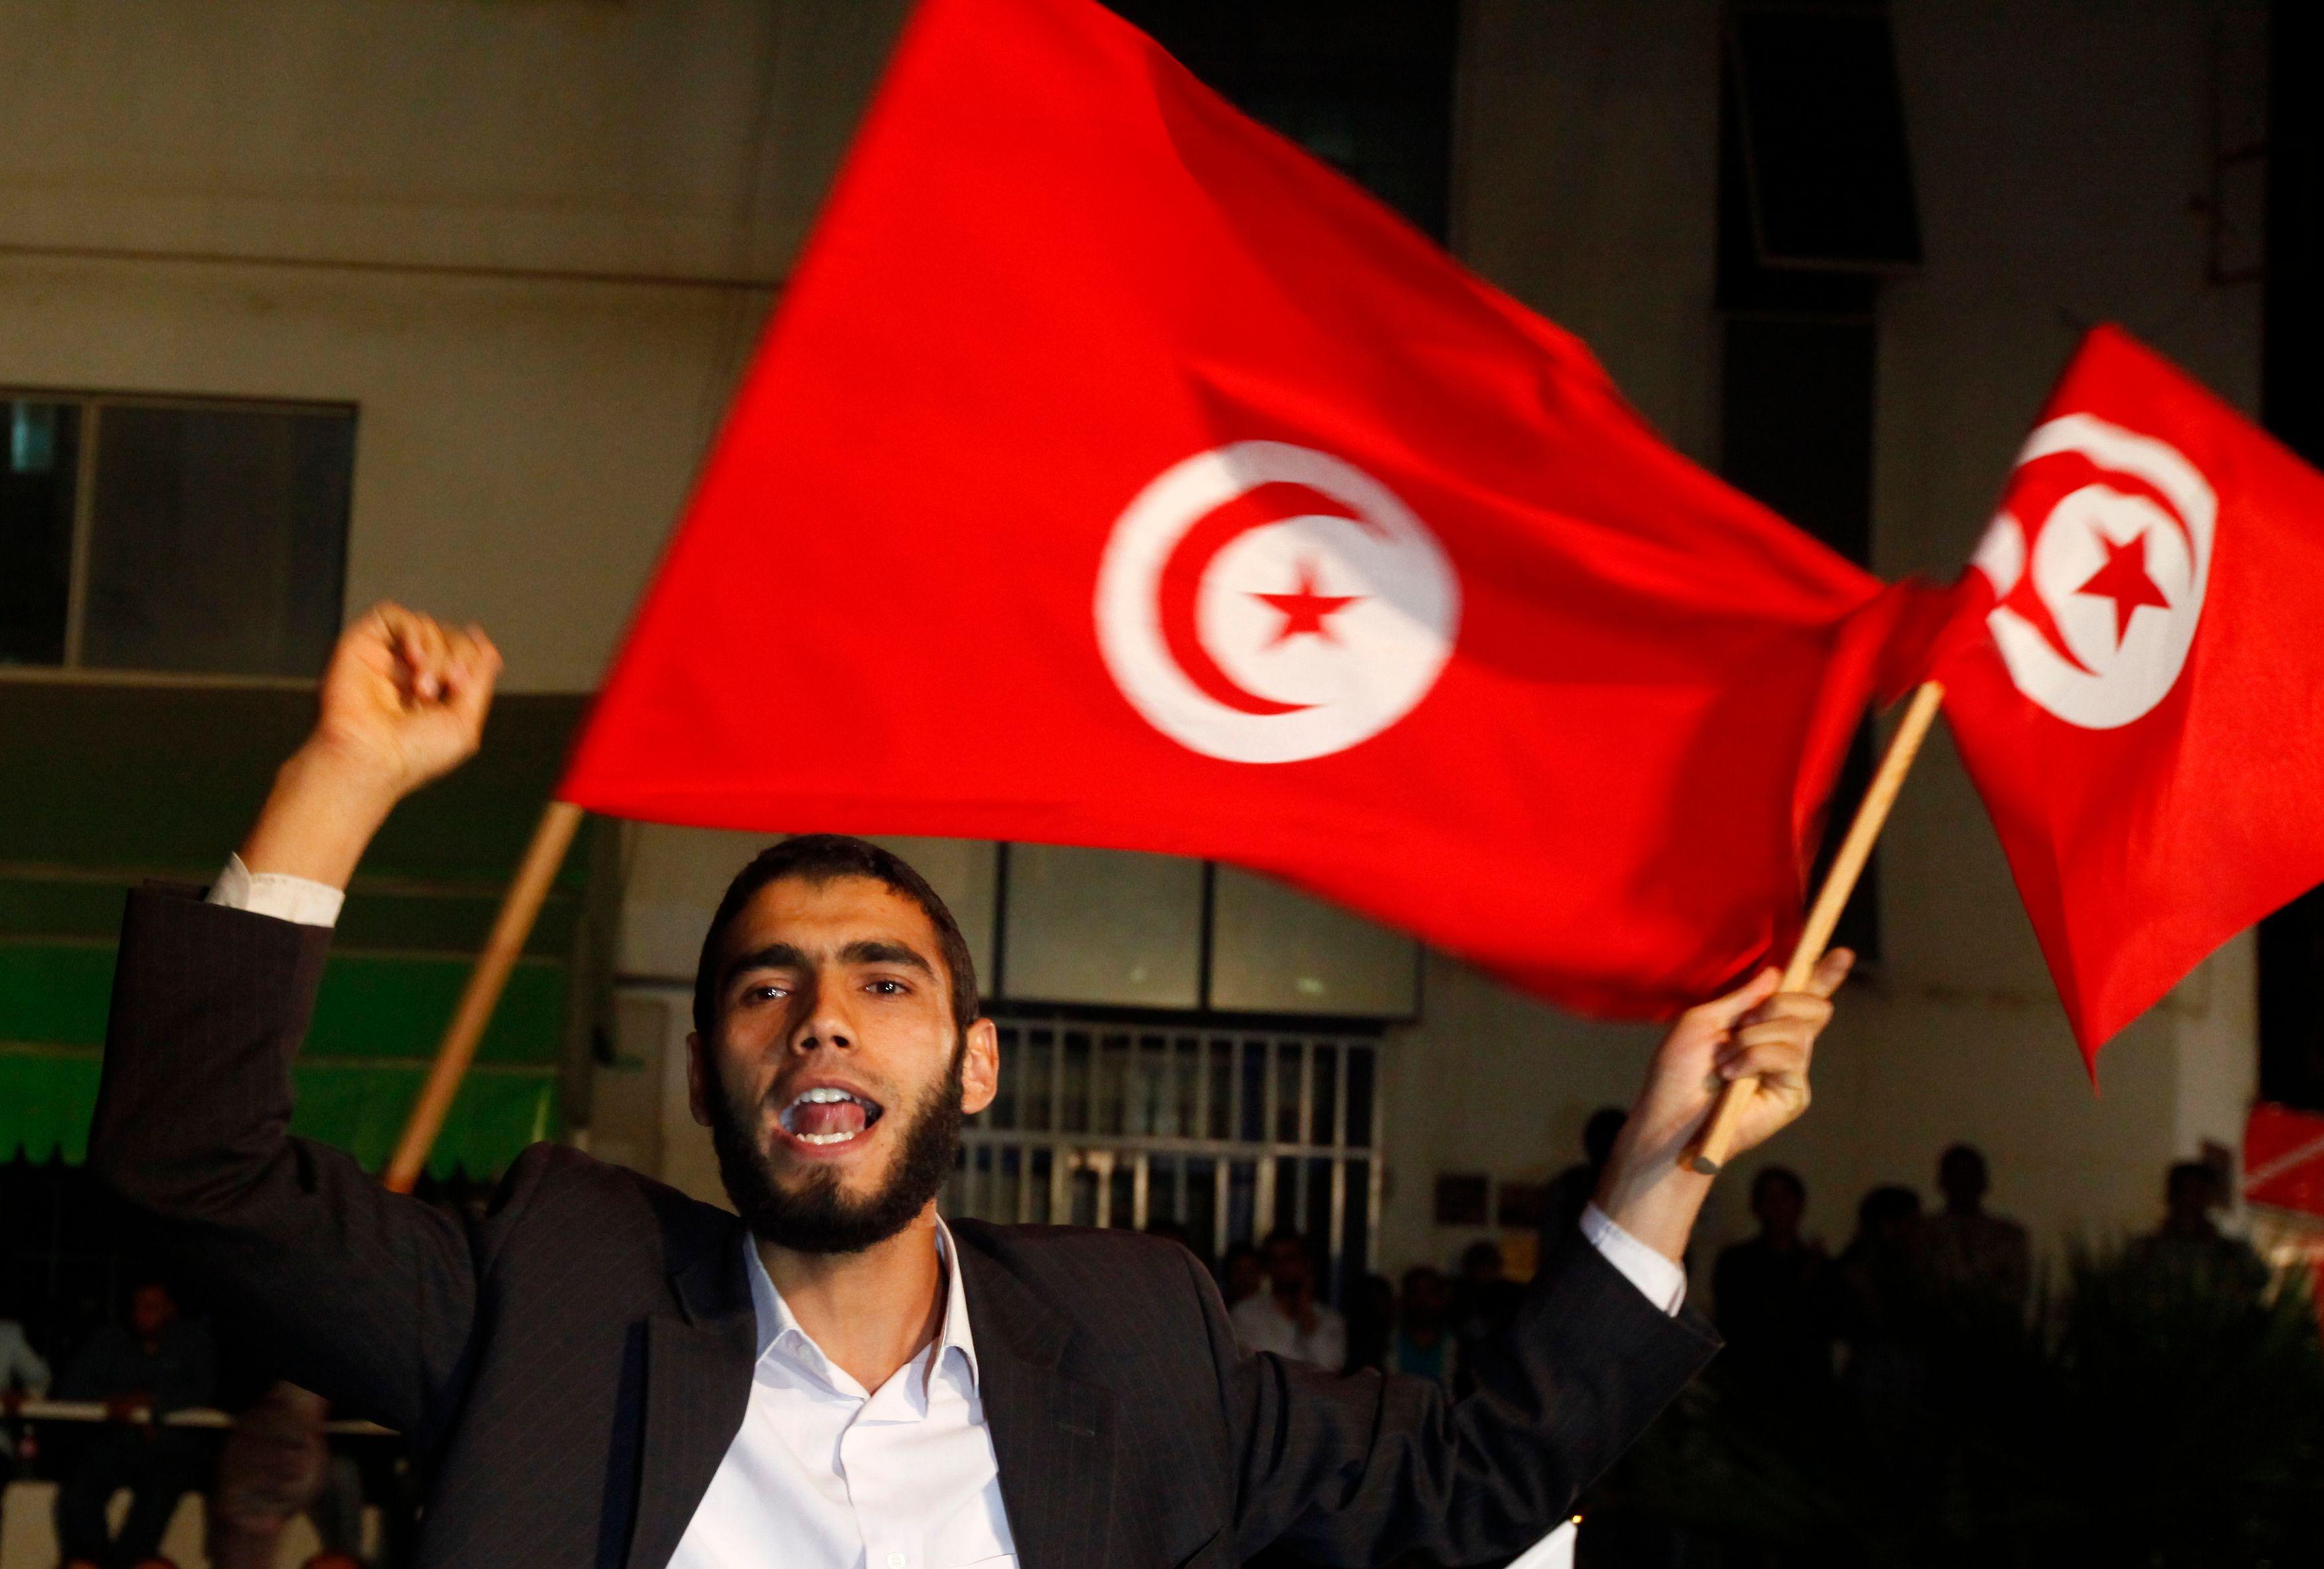 Le parti Ennahda, dirigé par Rached Ghannouchi, sort vainqueur du scrutin tunisien.